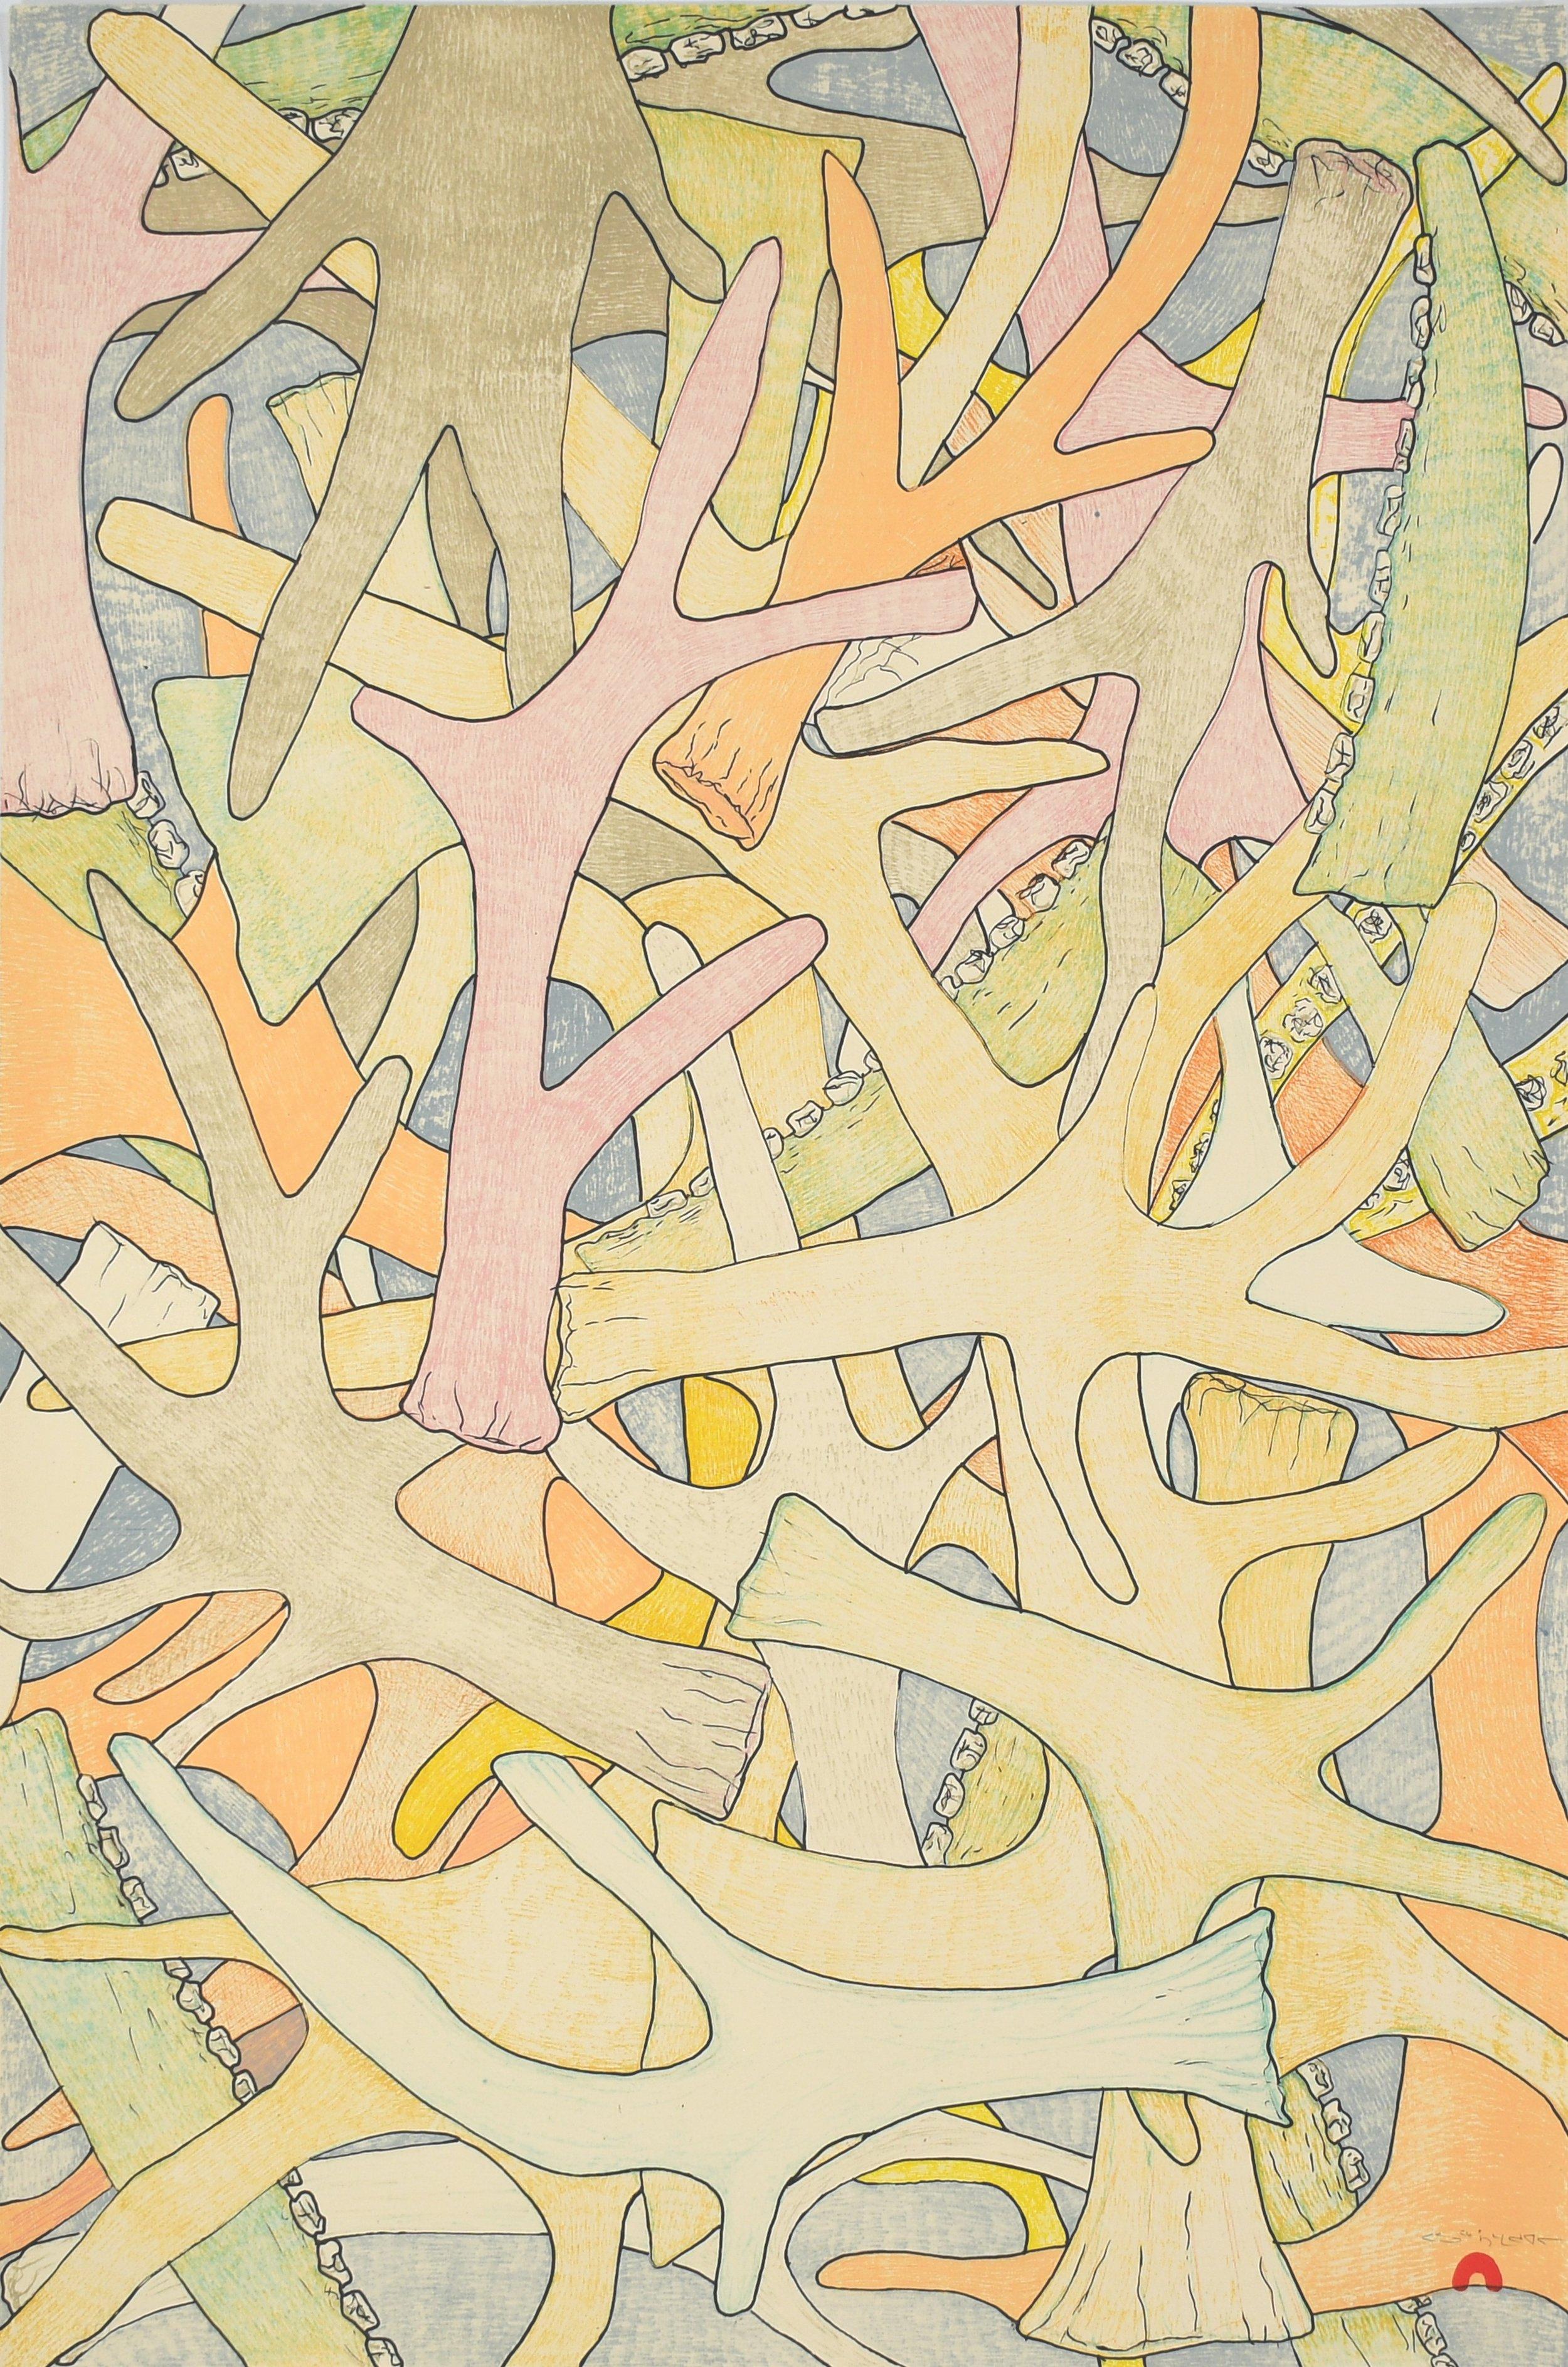 PADLOO SAMAYUALIE  19. Antlers & Bones  Lithograph  Paper: Arches Cover Cream  Printer: Niveaksie Quvianaqtuliaq  58.5 x 38 cm  $ 600